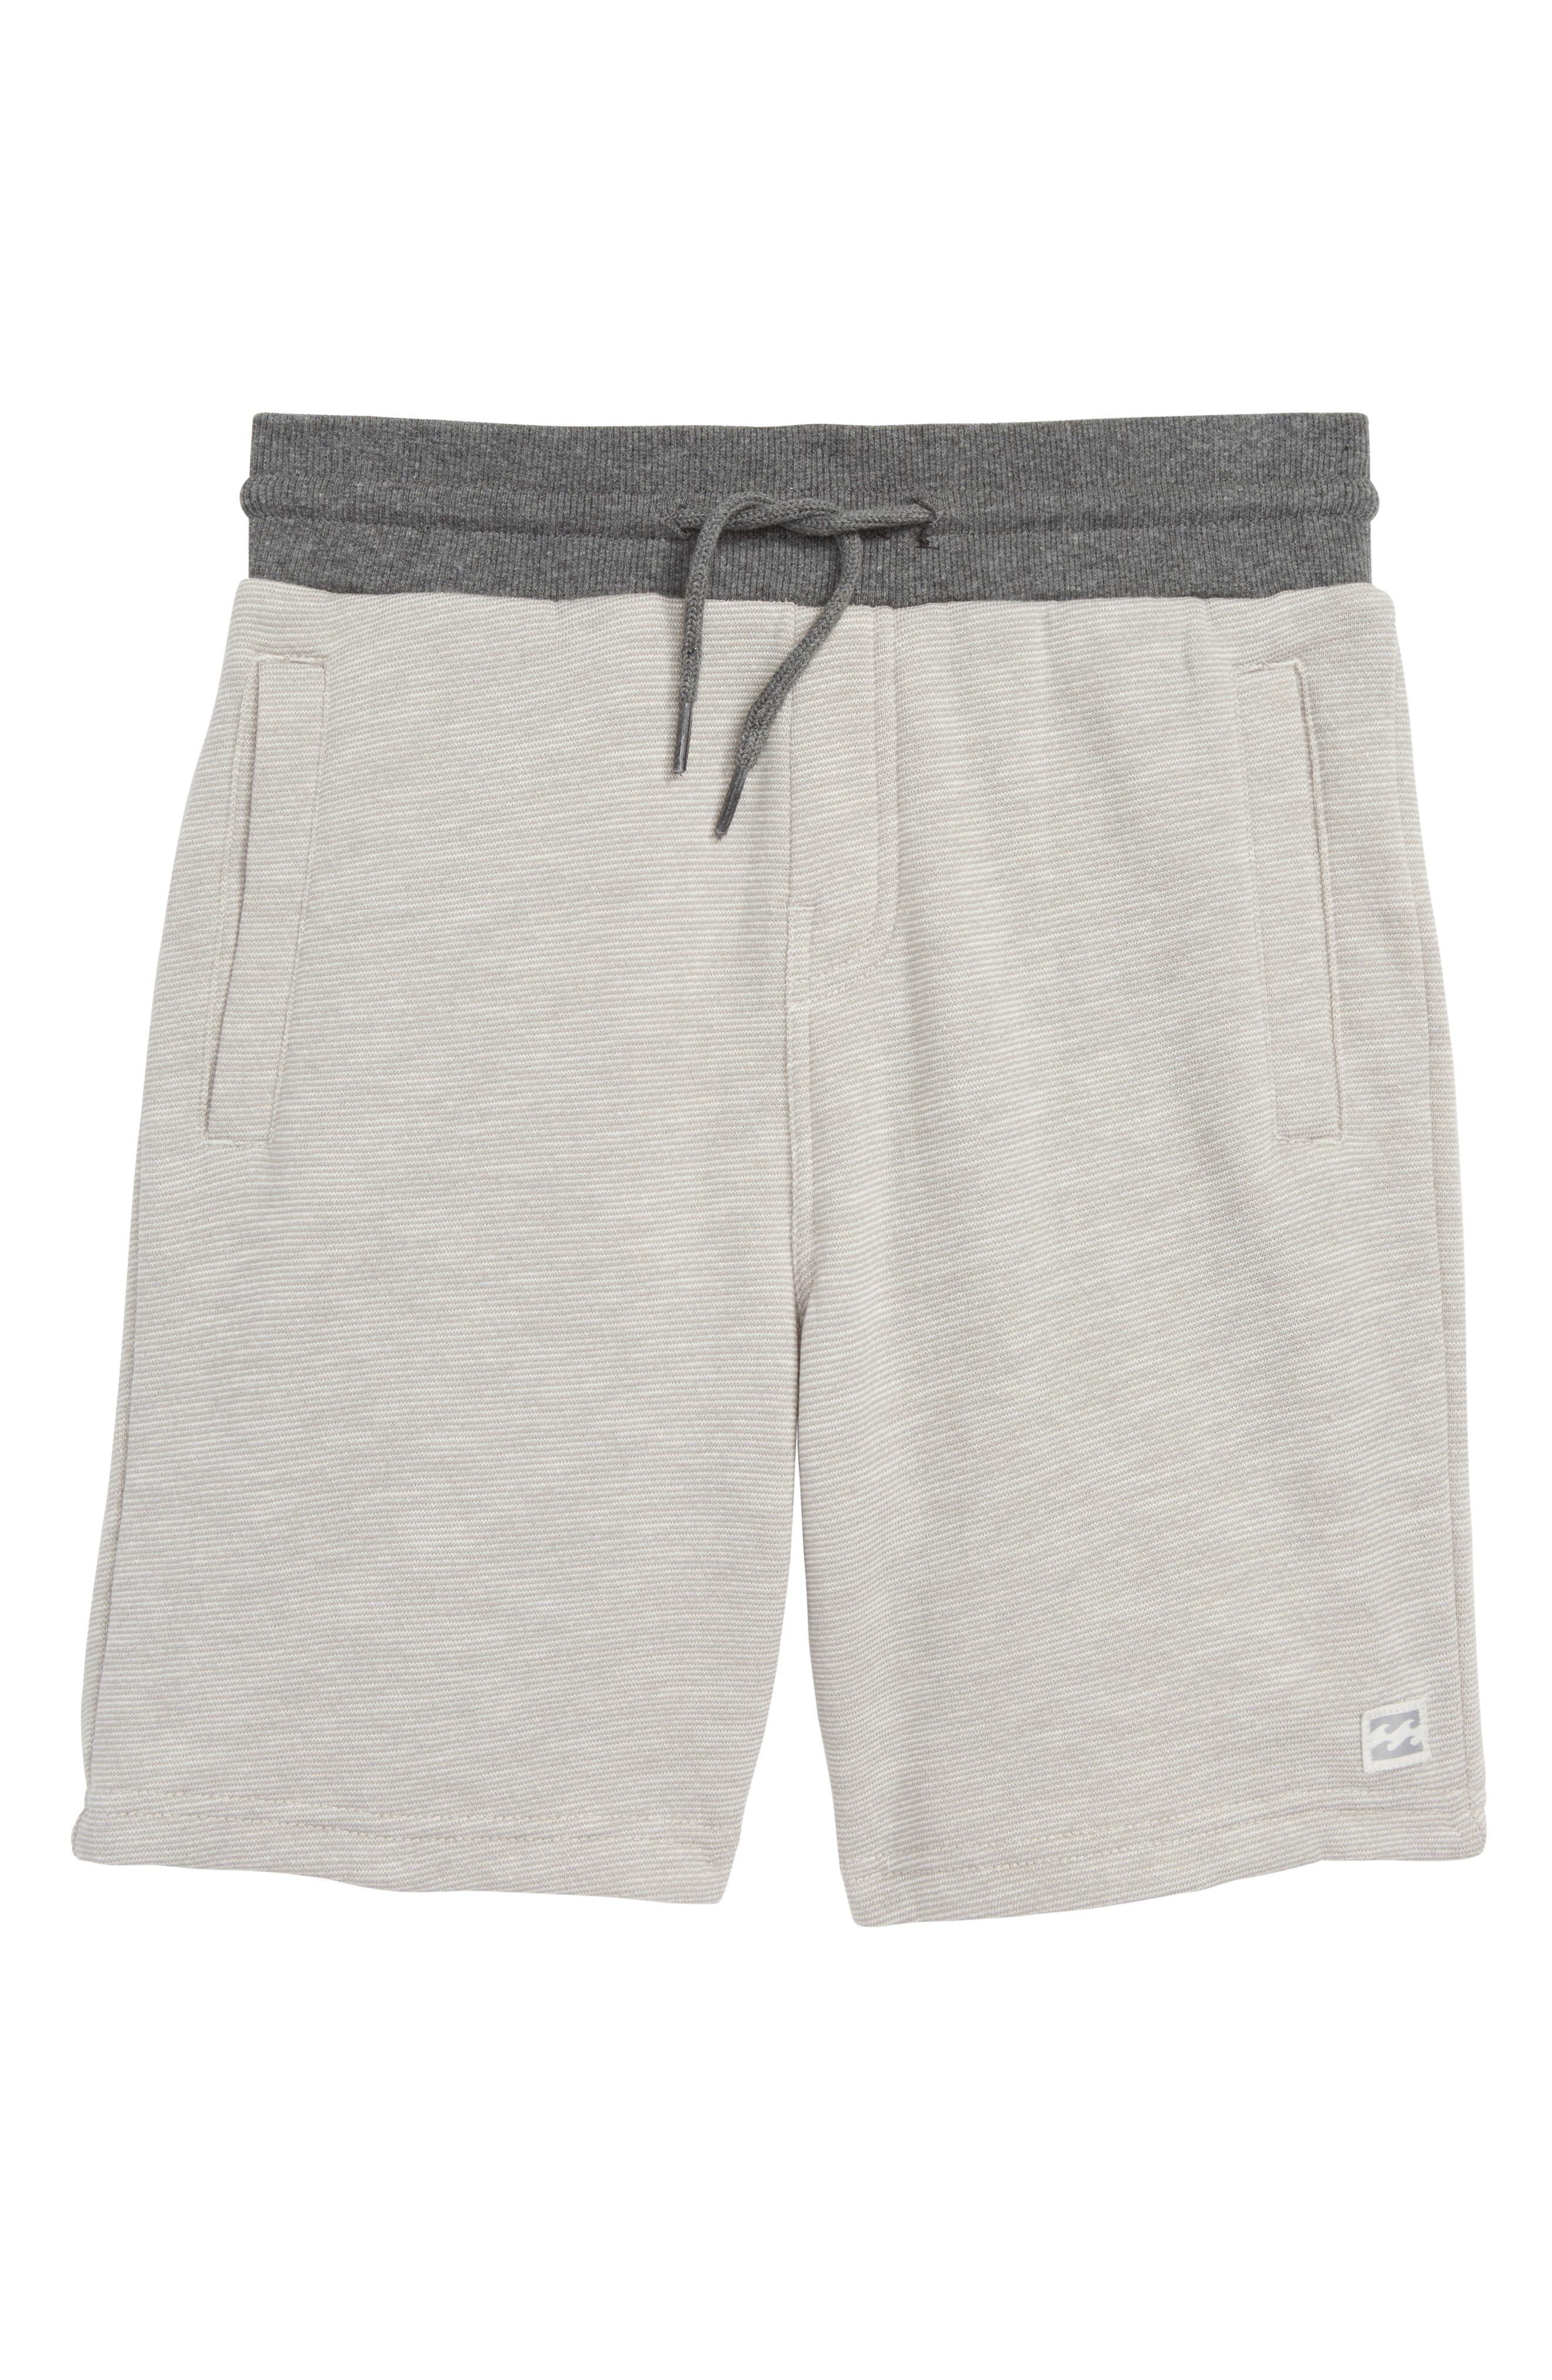 Balance Shorts,                         Main,                         color, OATMEAL